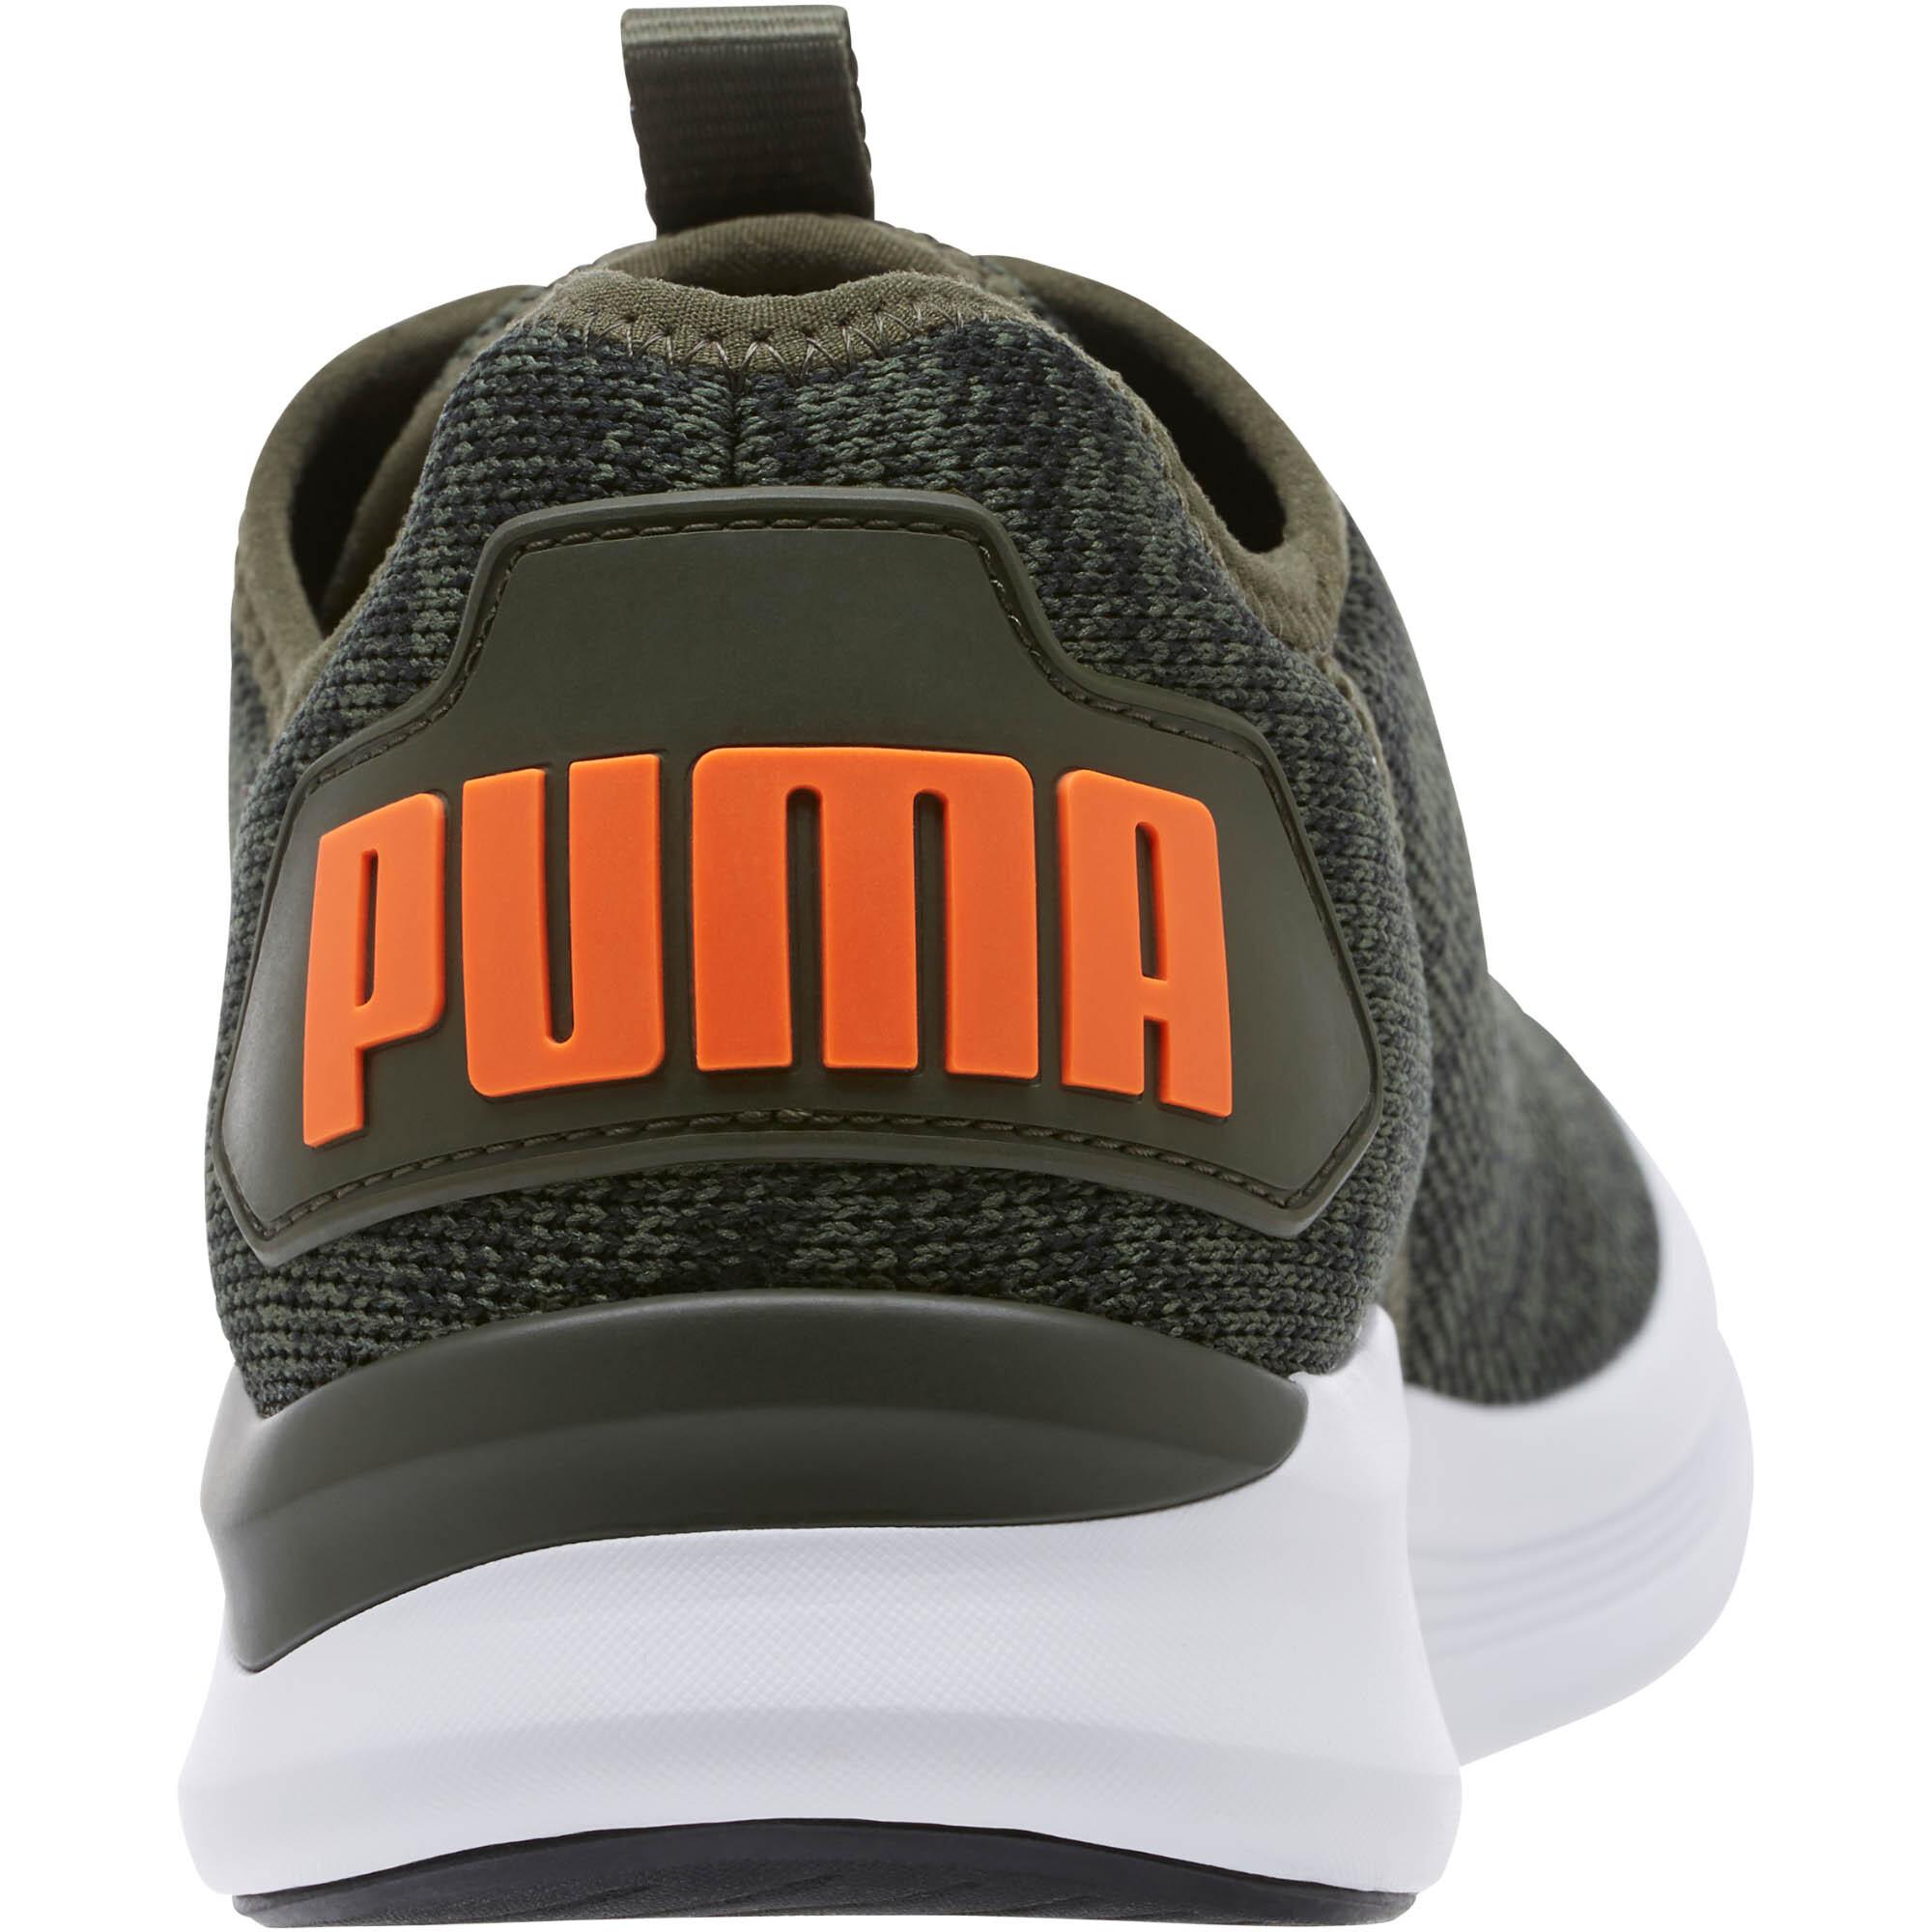 PUMA-Ballast-Men-039-s-Running-Shoes-Men-Shoe-Running thumbnail 3